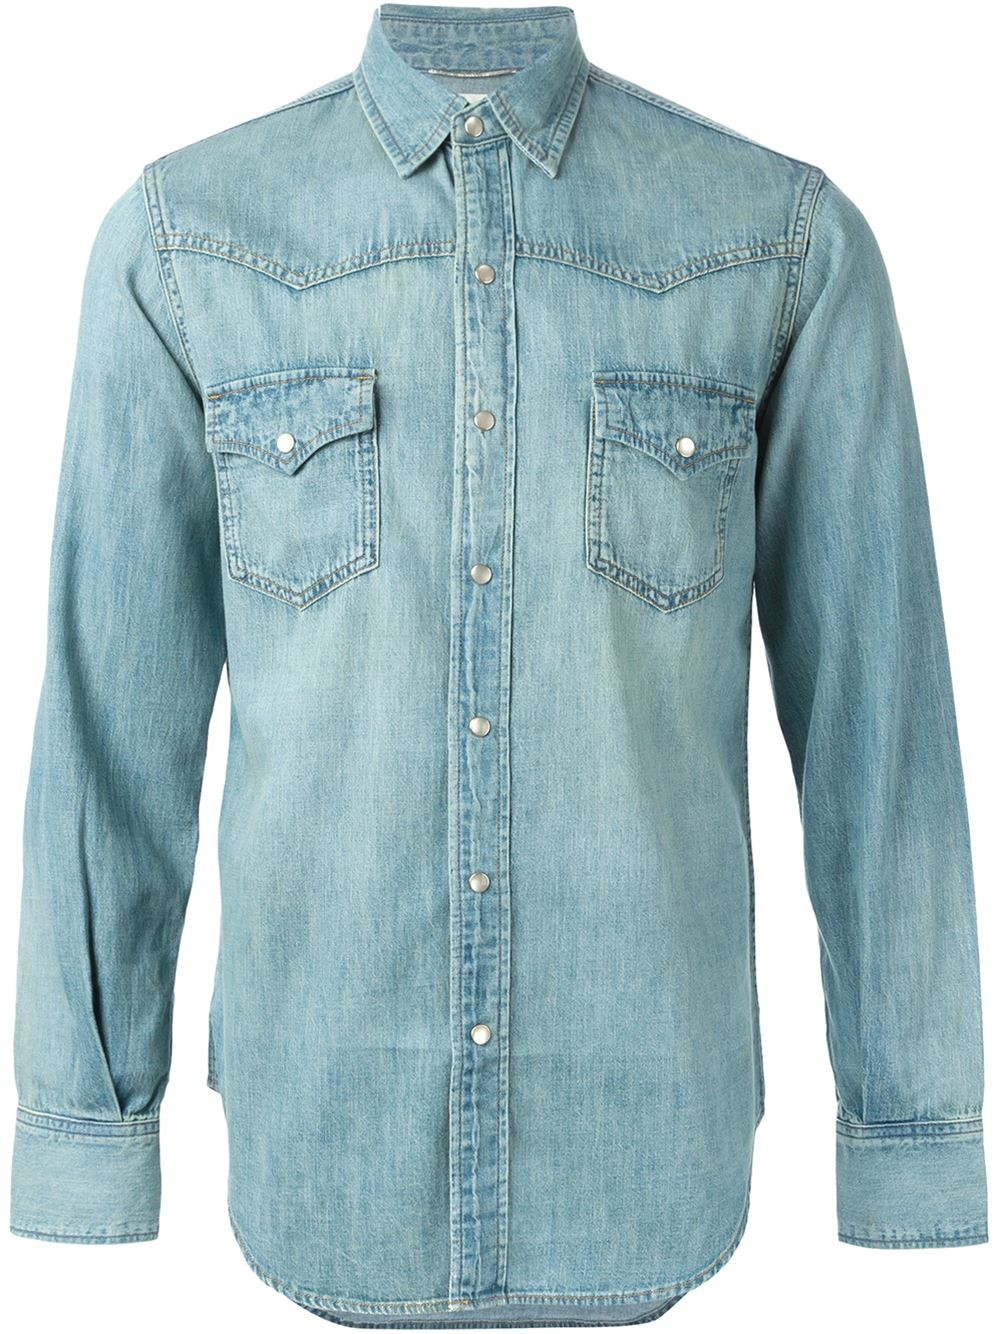 c81c8912b0ba Saint Laurent Denim Western Shirt in Blue for Men - Lyst